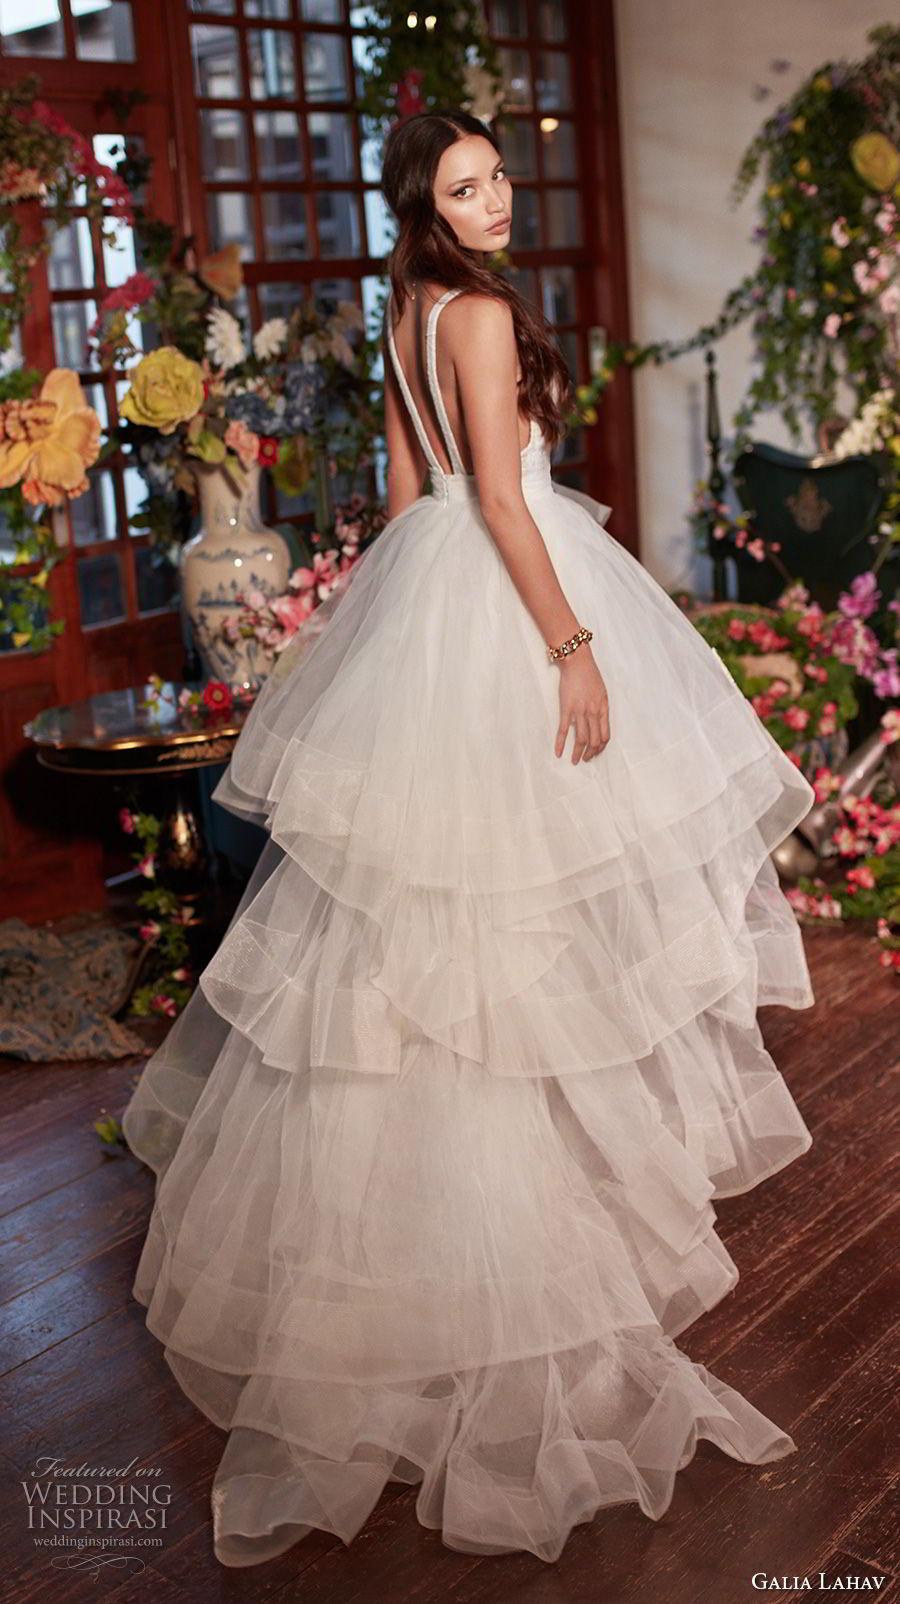 galia lahav couture fall 2018 bridal sleeveless deep v neck heavily embellished bodice tulle layered skirt sexy romantic a  line wedding dress open back medium train (8) bv